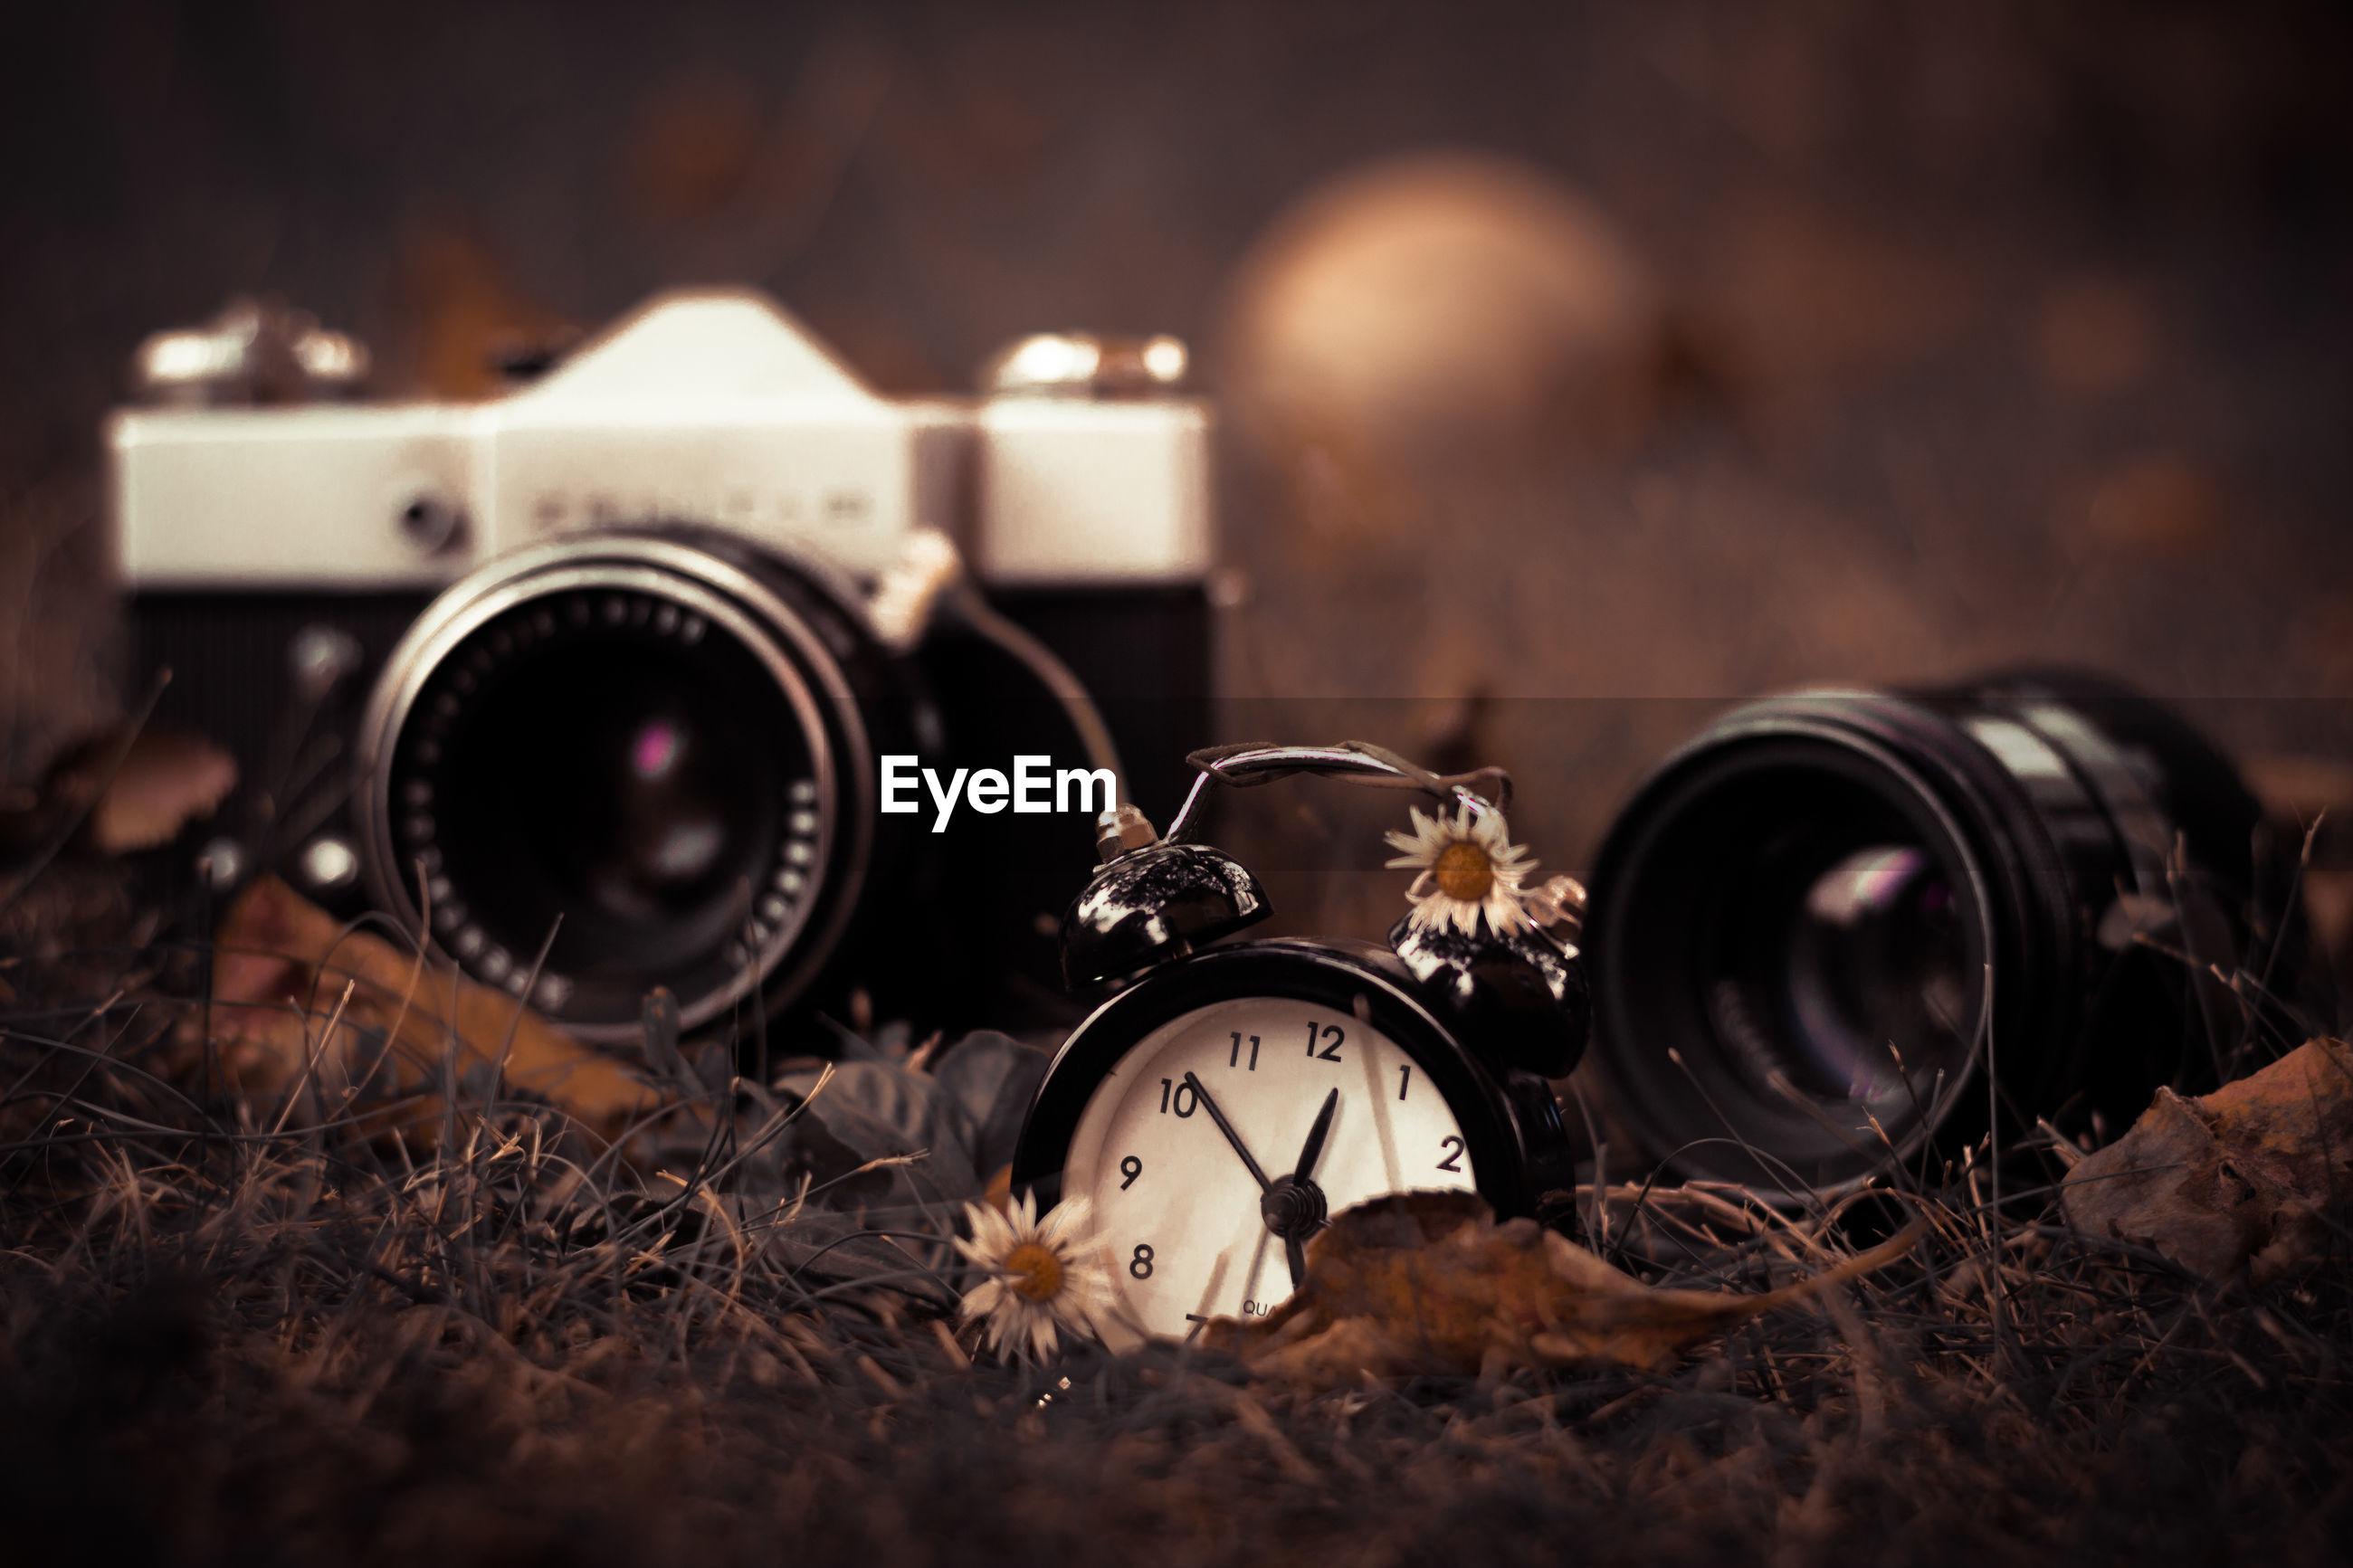 Close-up of clock and camera